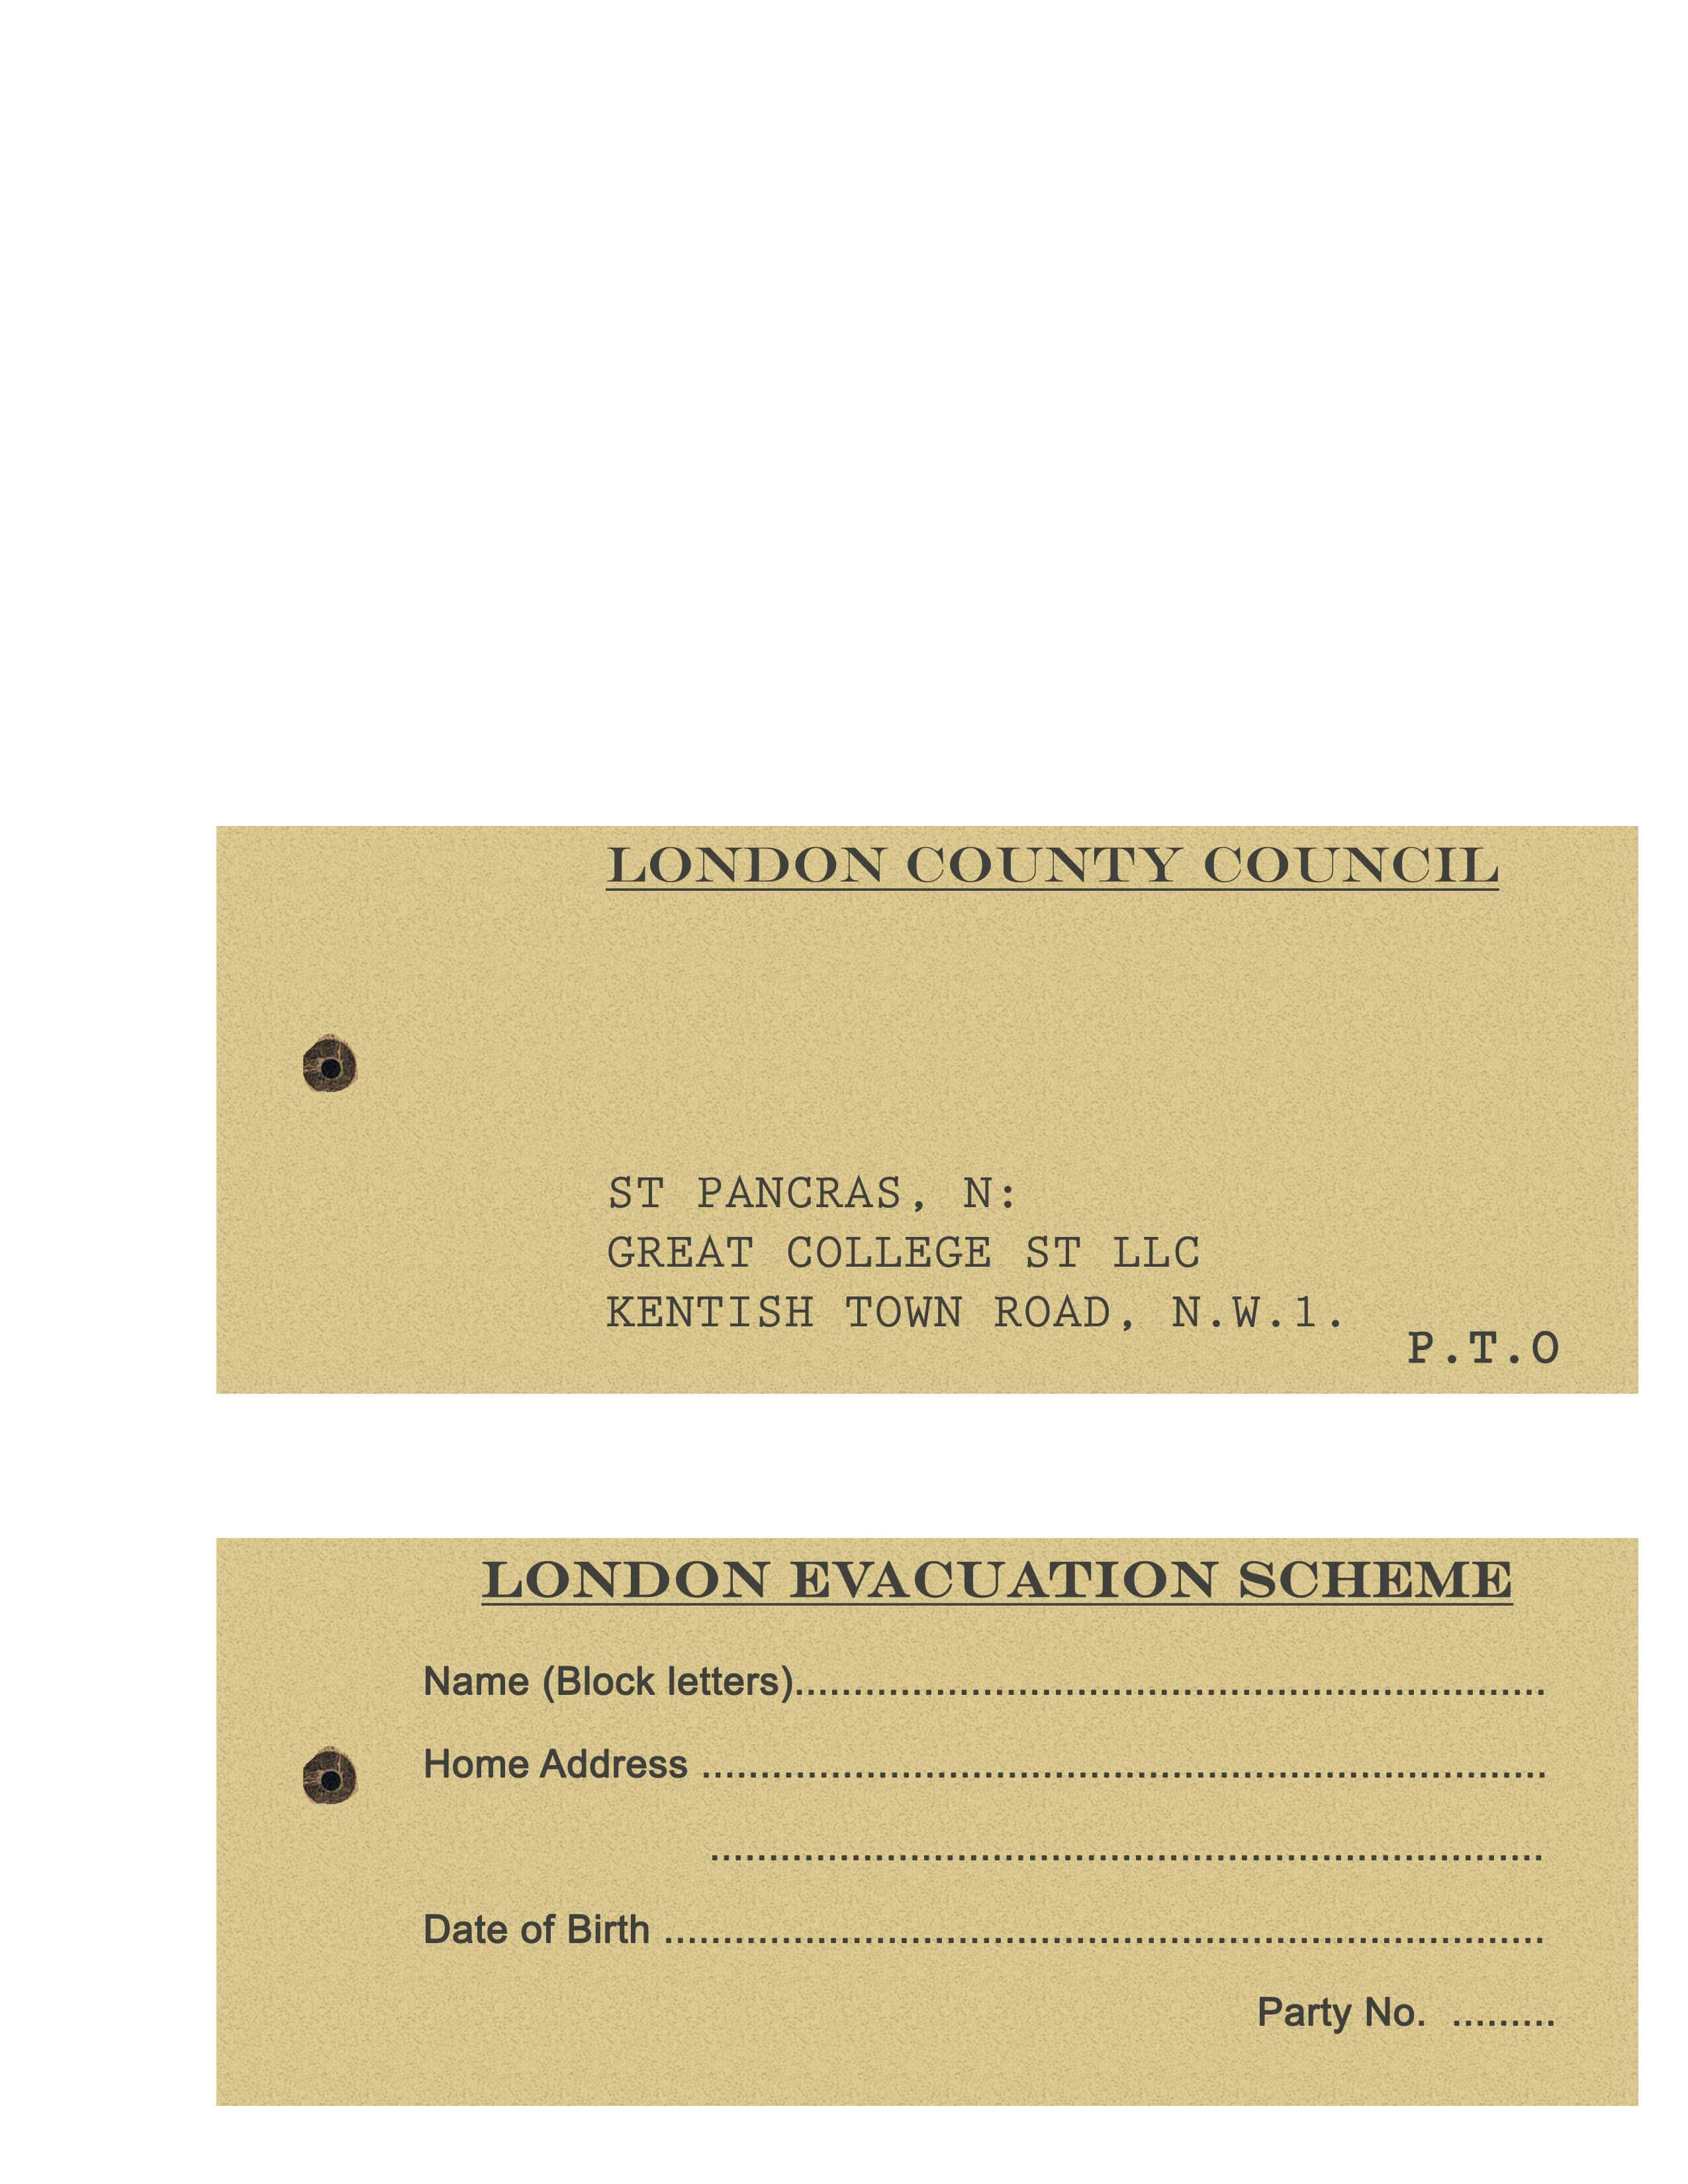 Pin On School Stuff in World War 2 Identity Card Template